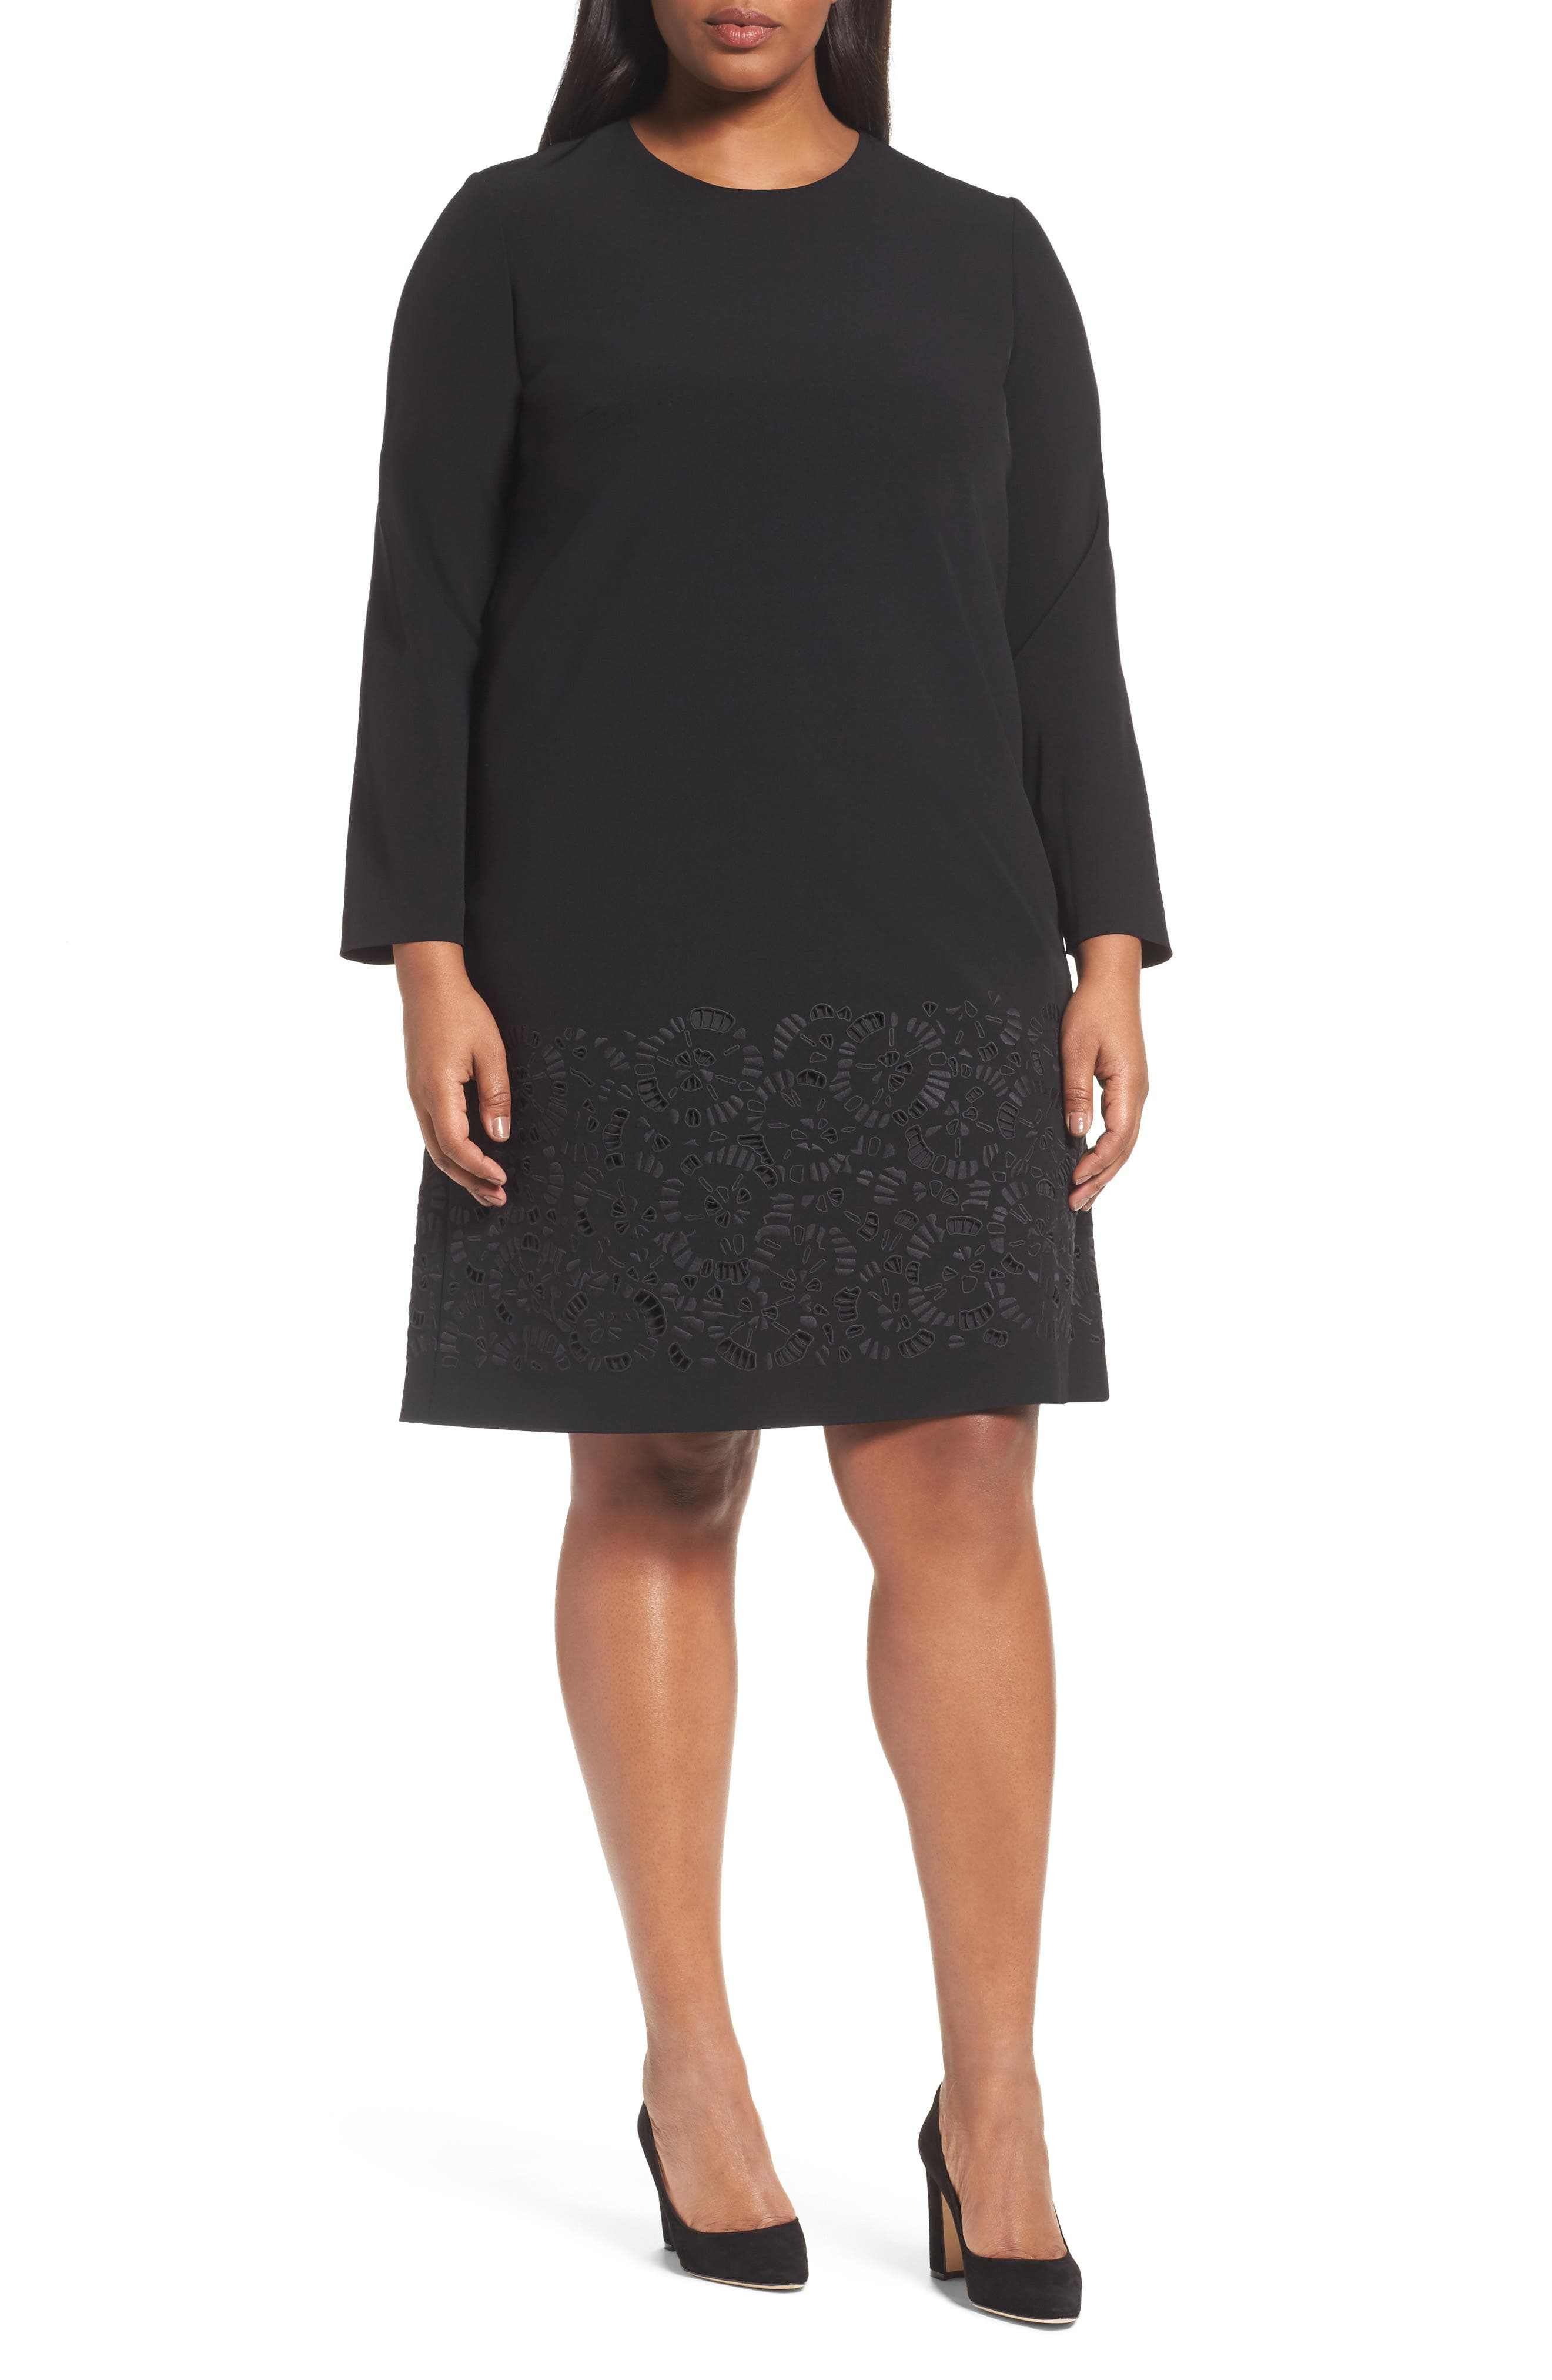 Corbin Laser Cut Dress,                         Main,                         color, Black